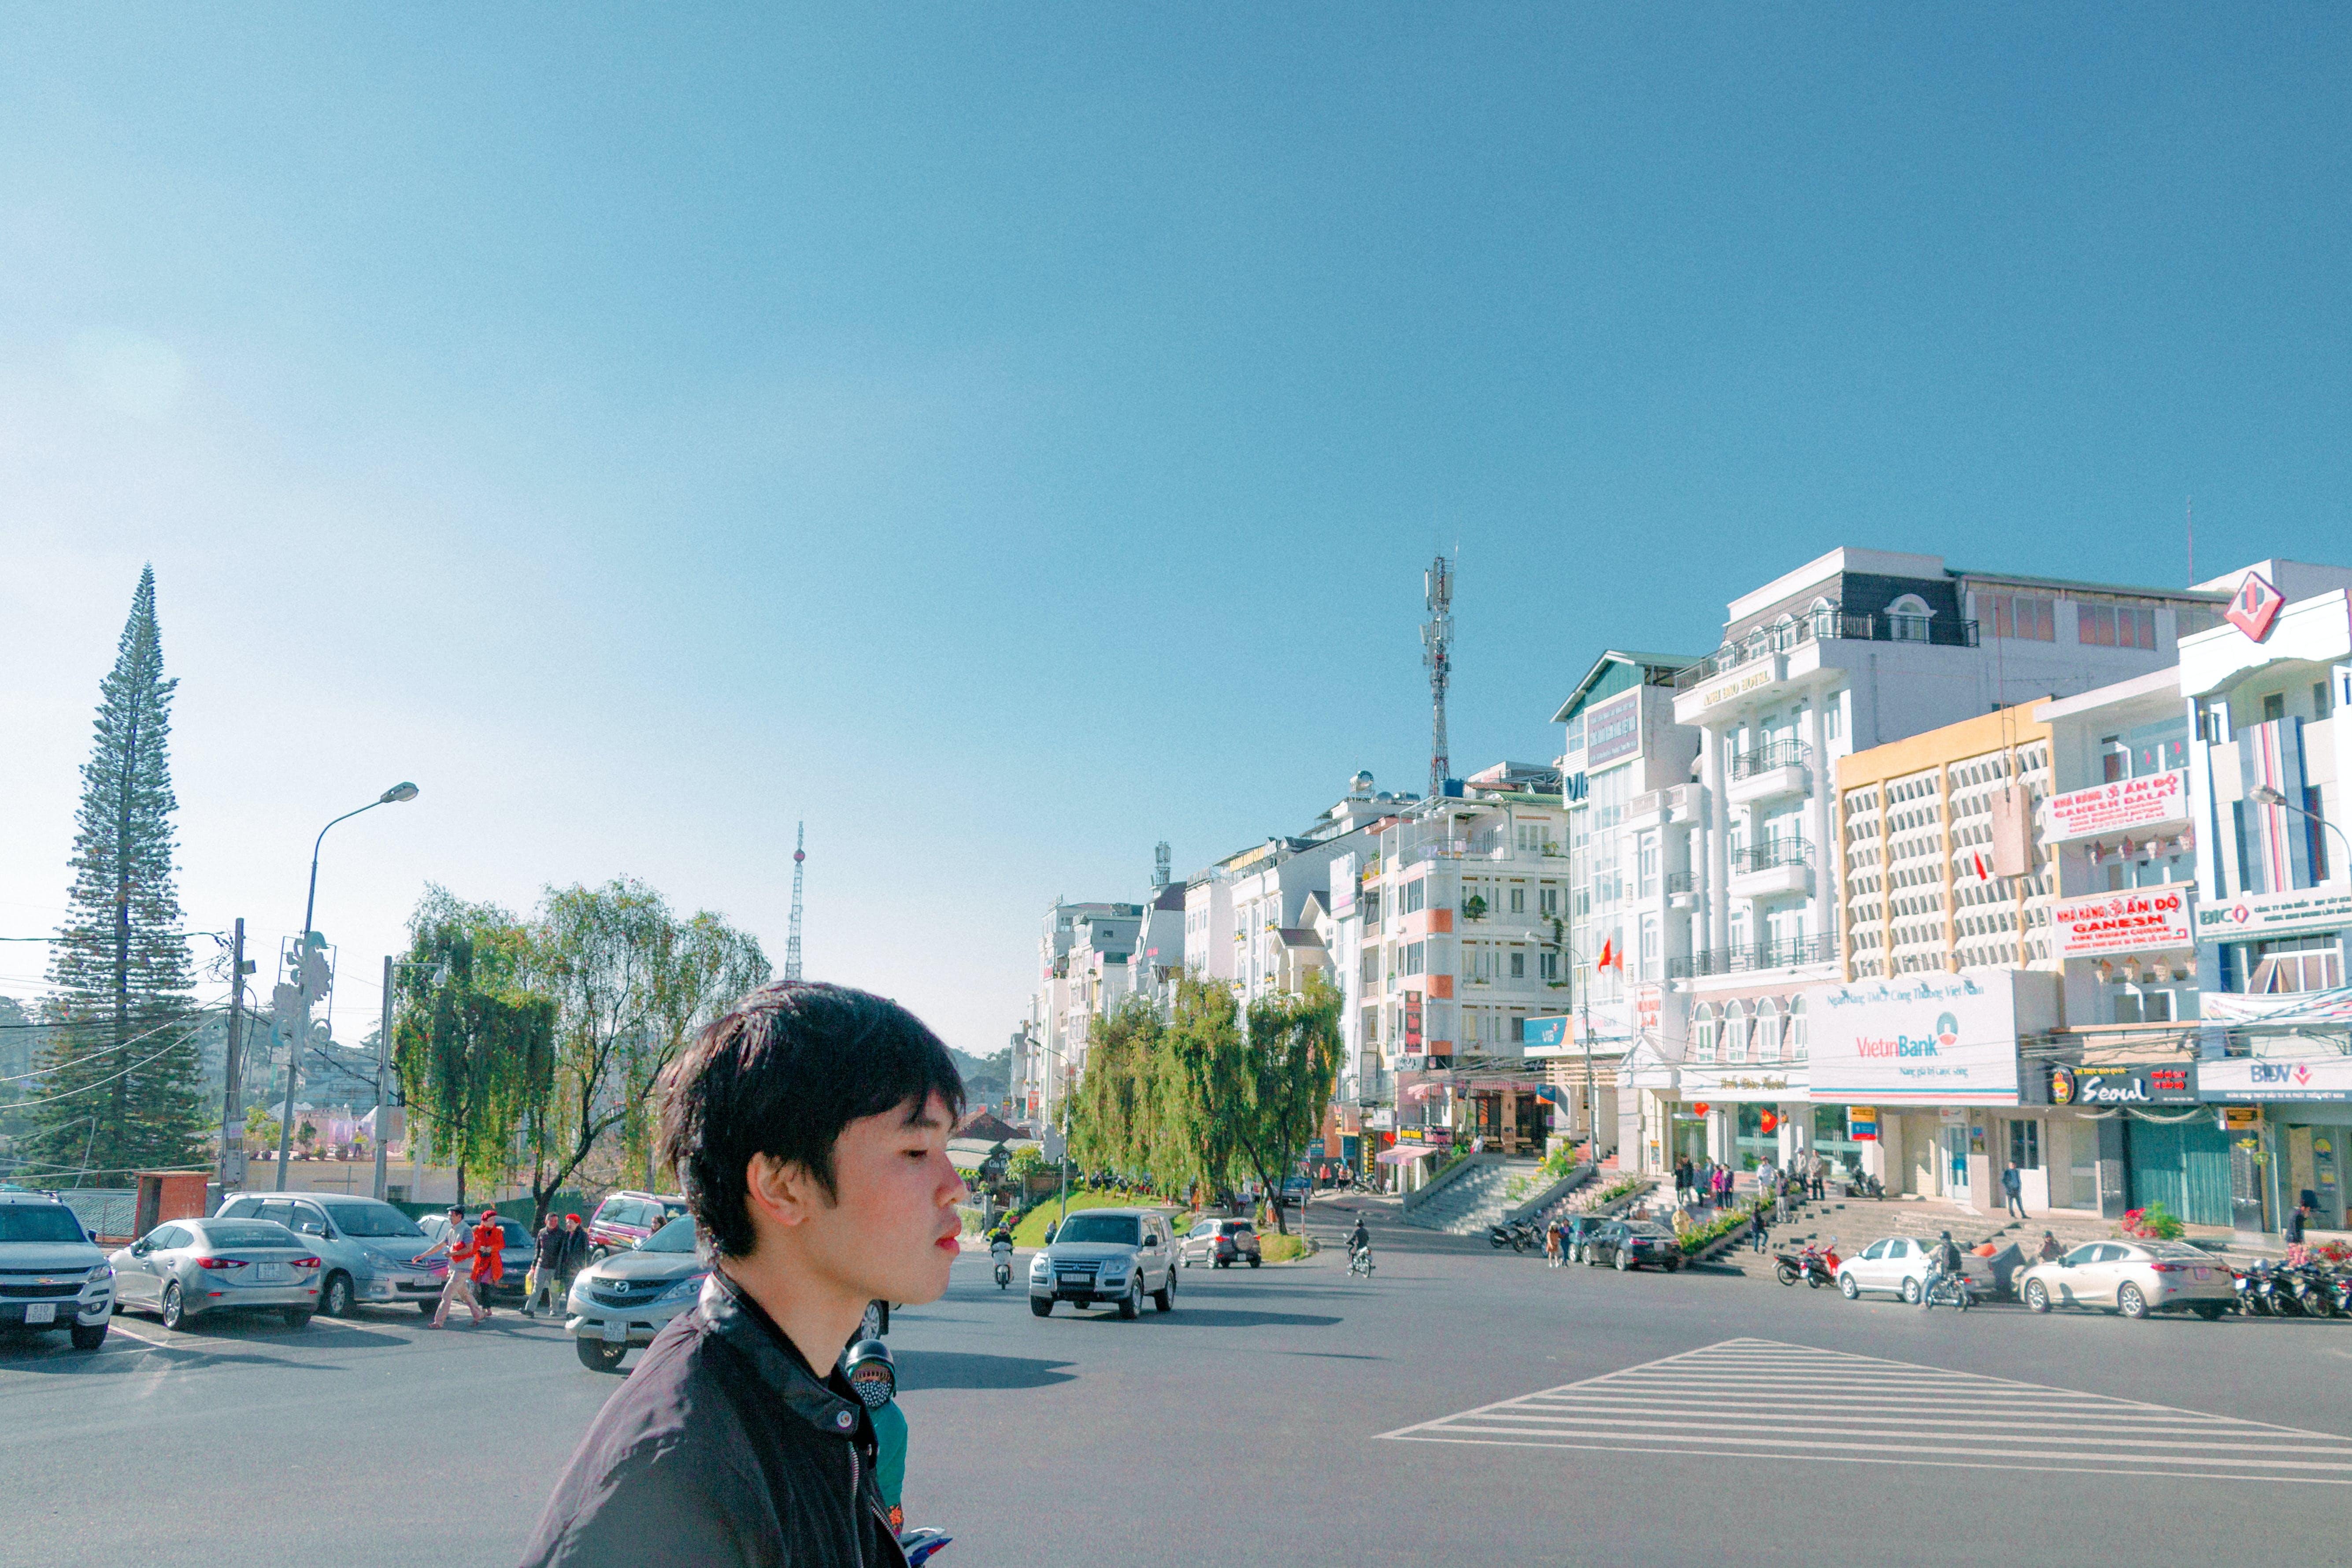 Man Walking on Street Overlooking Building Under Blue Sky